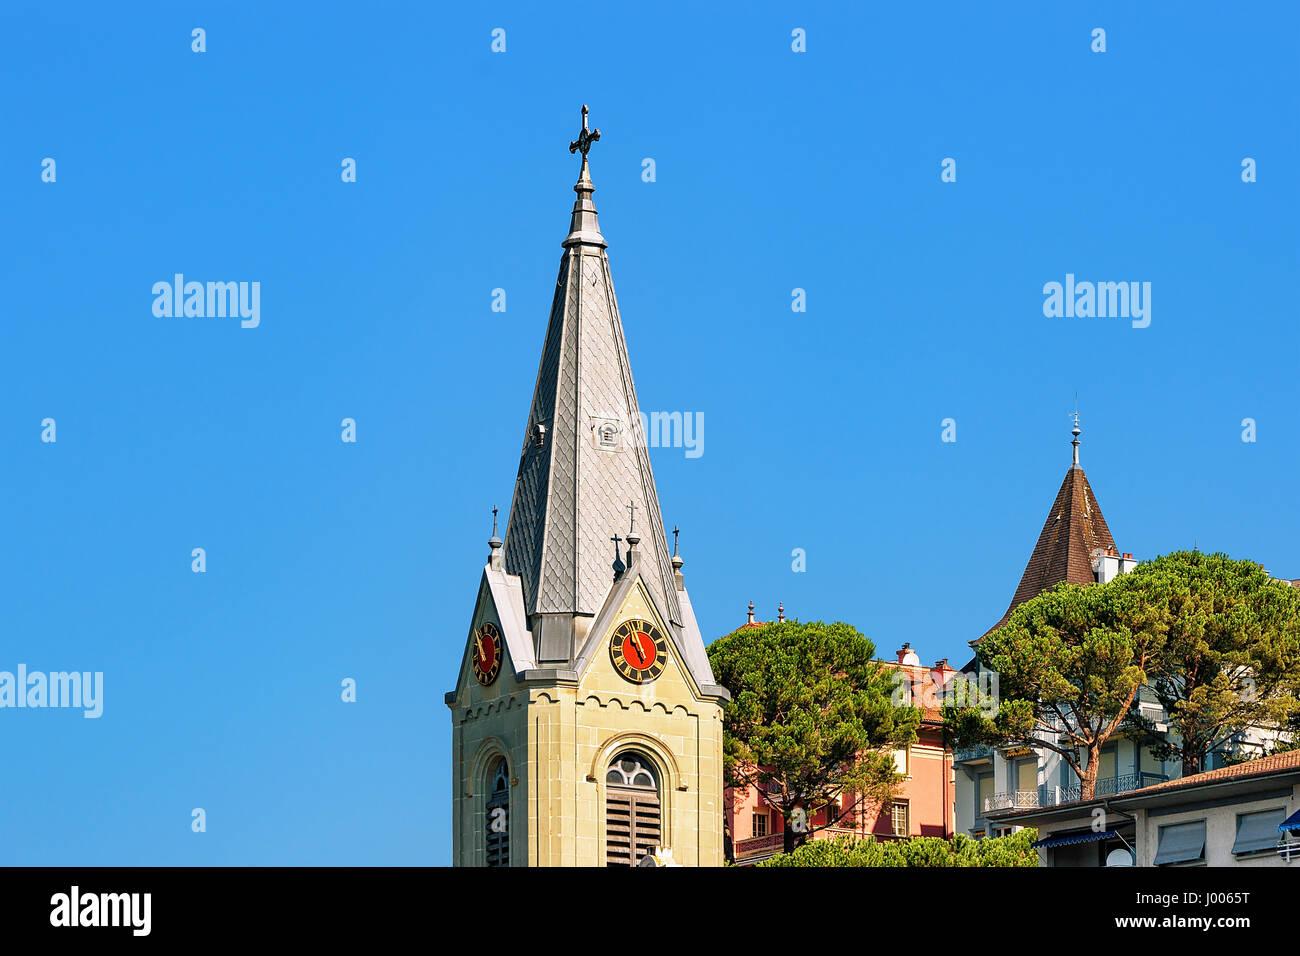 Church clock tower at Geneva Lake Riviera in Montreux, Vaud canton, Switzerland - Stock Image